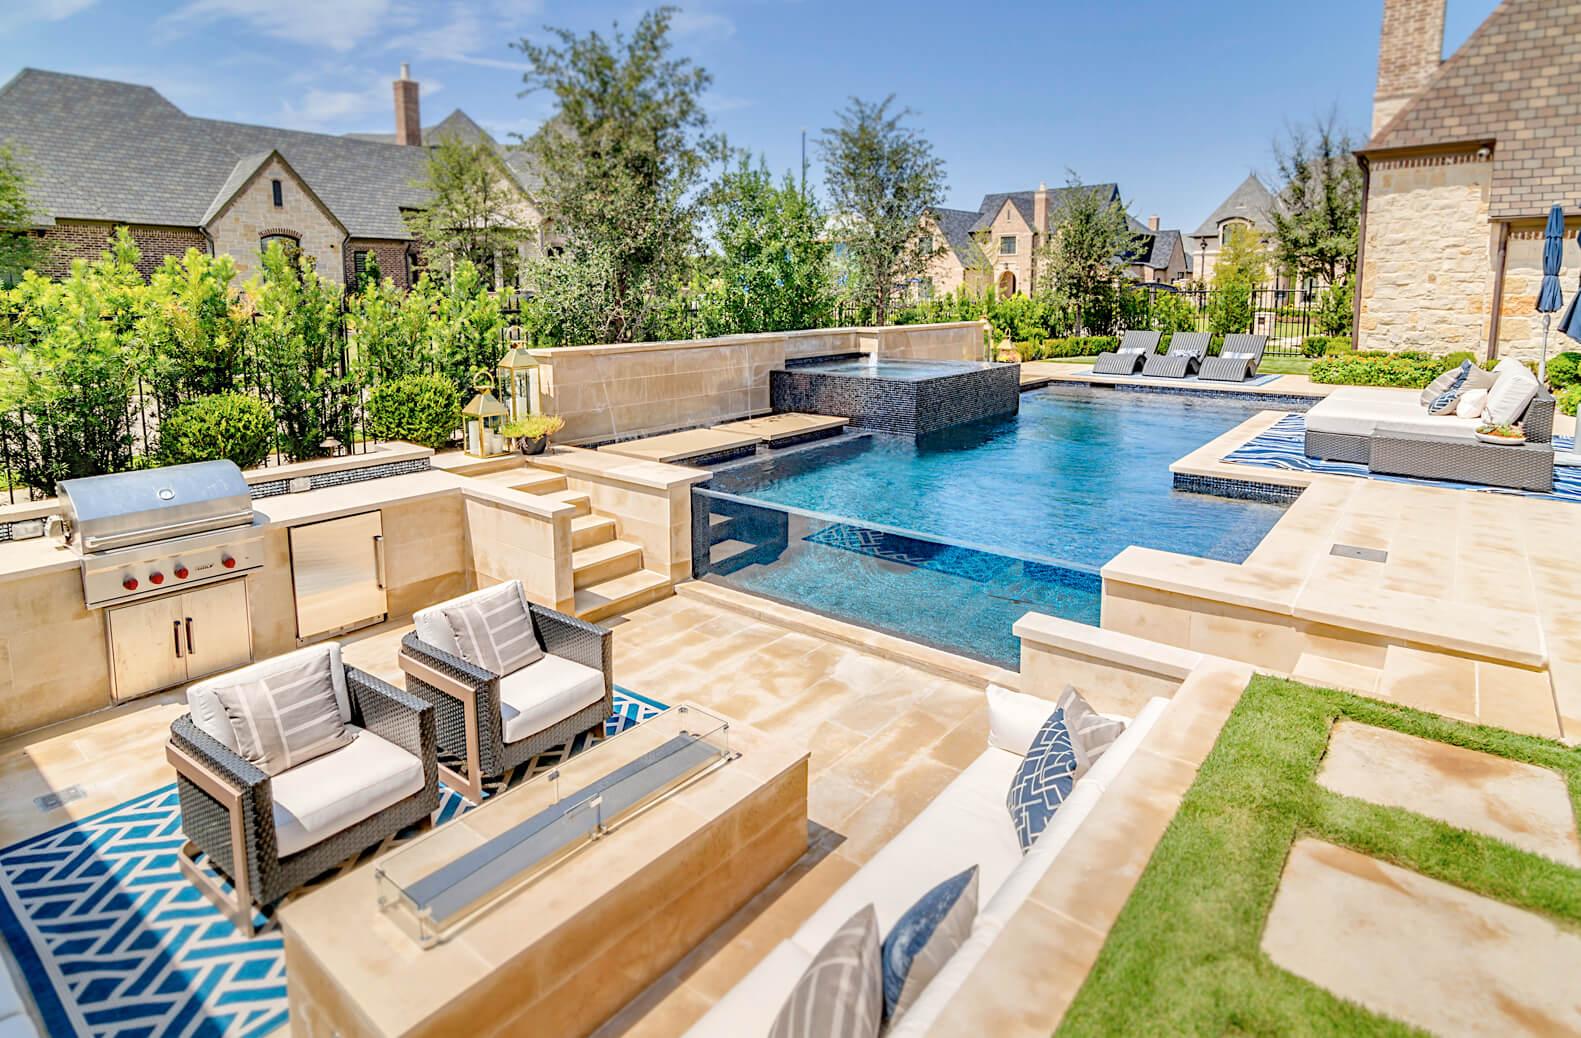 #6 Pool Contractor in America Riverbend Sandler Pools